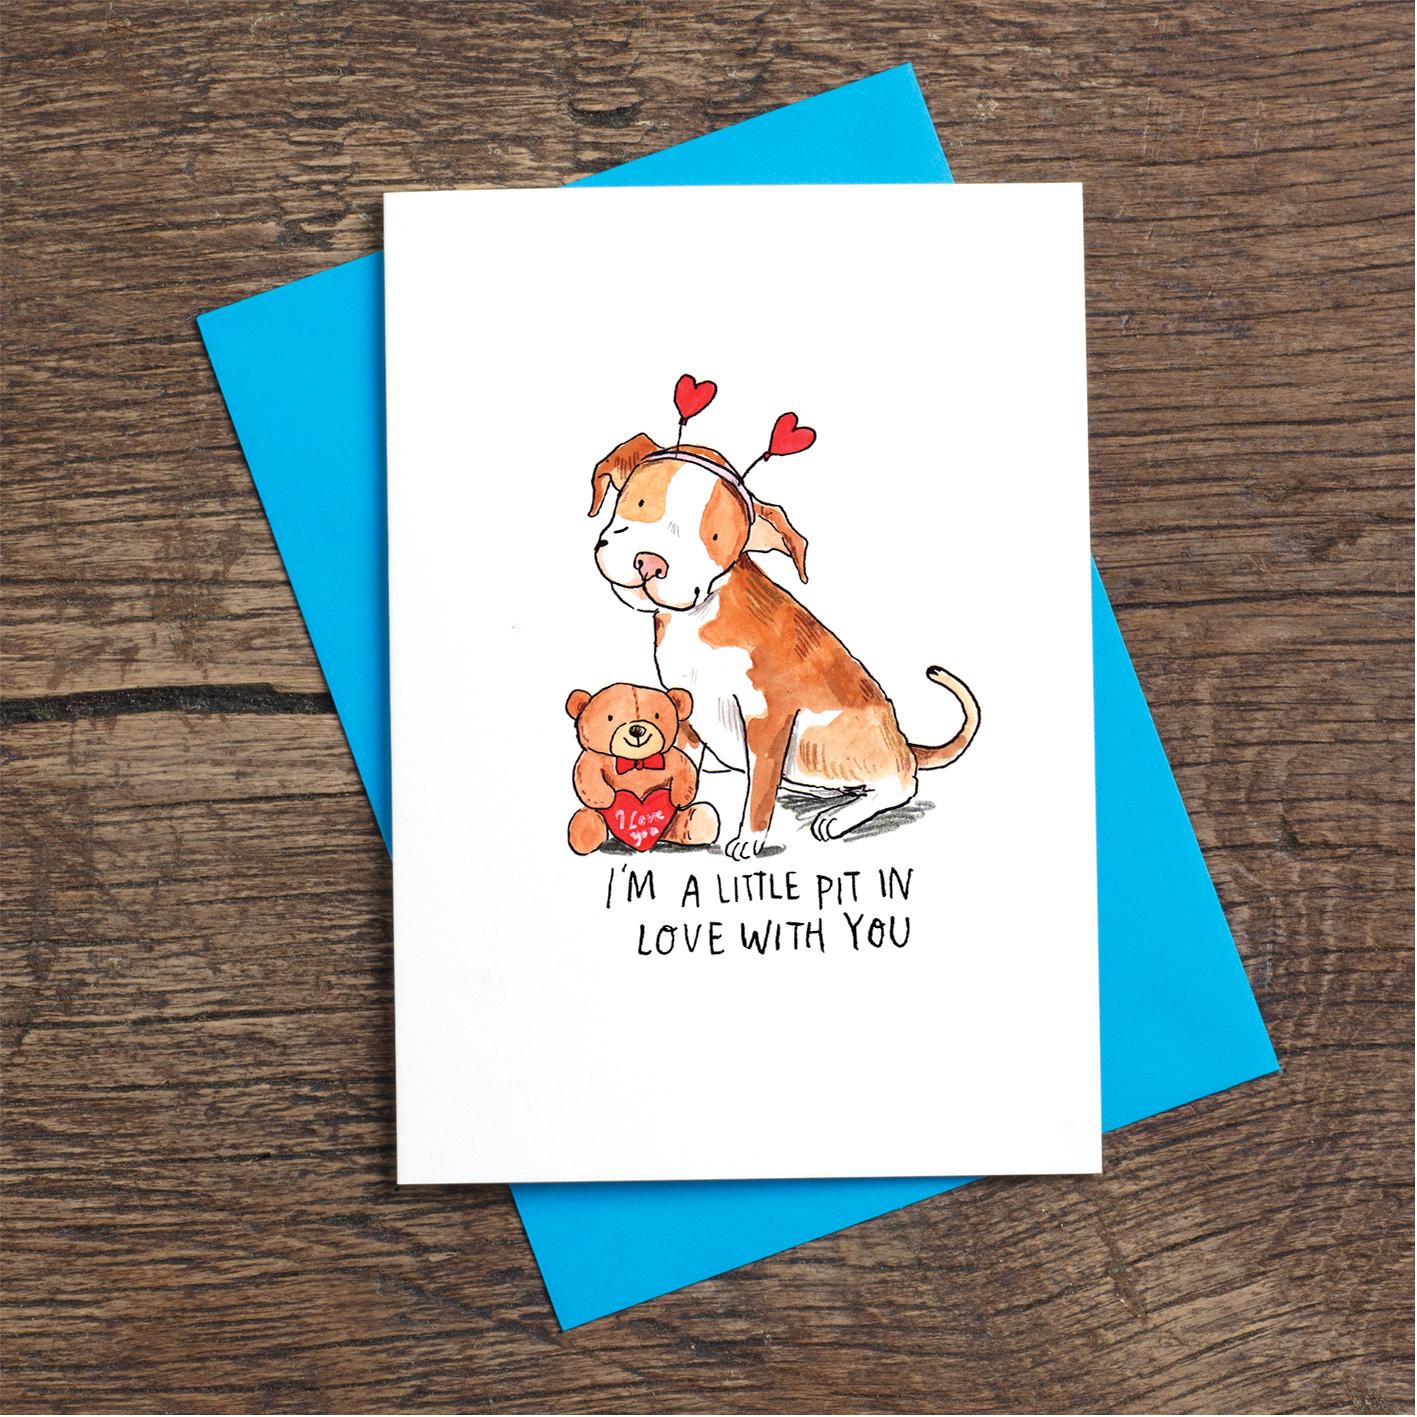 Little-Pit-Romantic-dog-themed-greetings-card_SM71_FLC